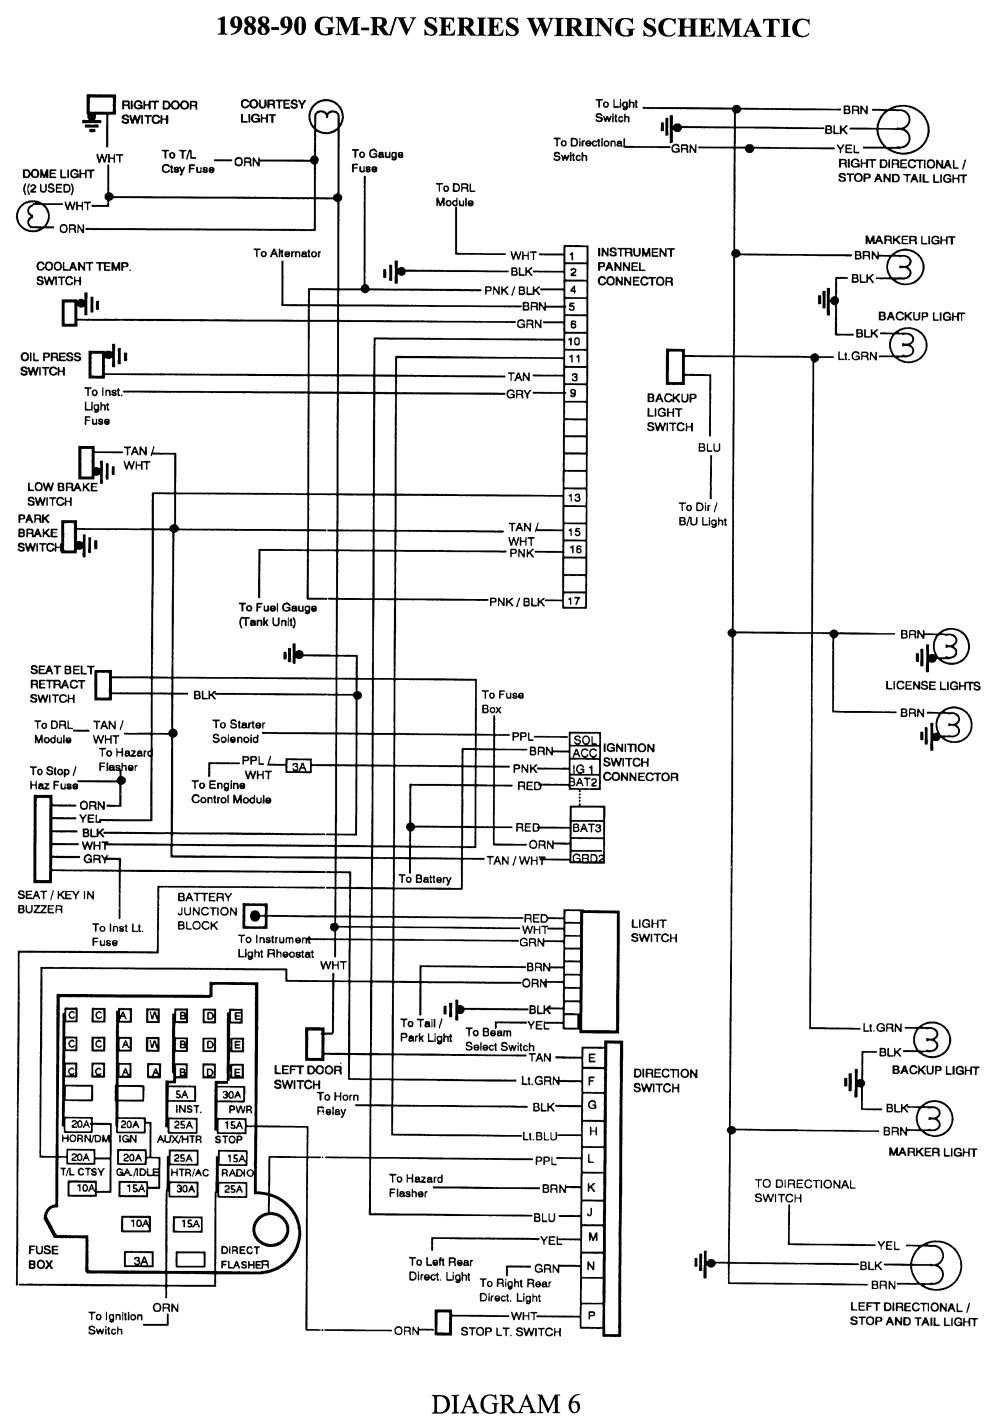 89 K5 Blazer Wiring Diagram C1500 Wiring Diagram Wiring Diagram Post